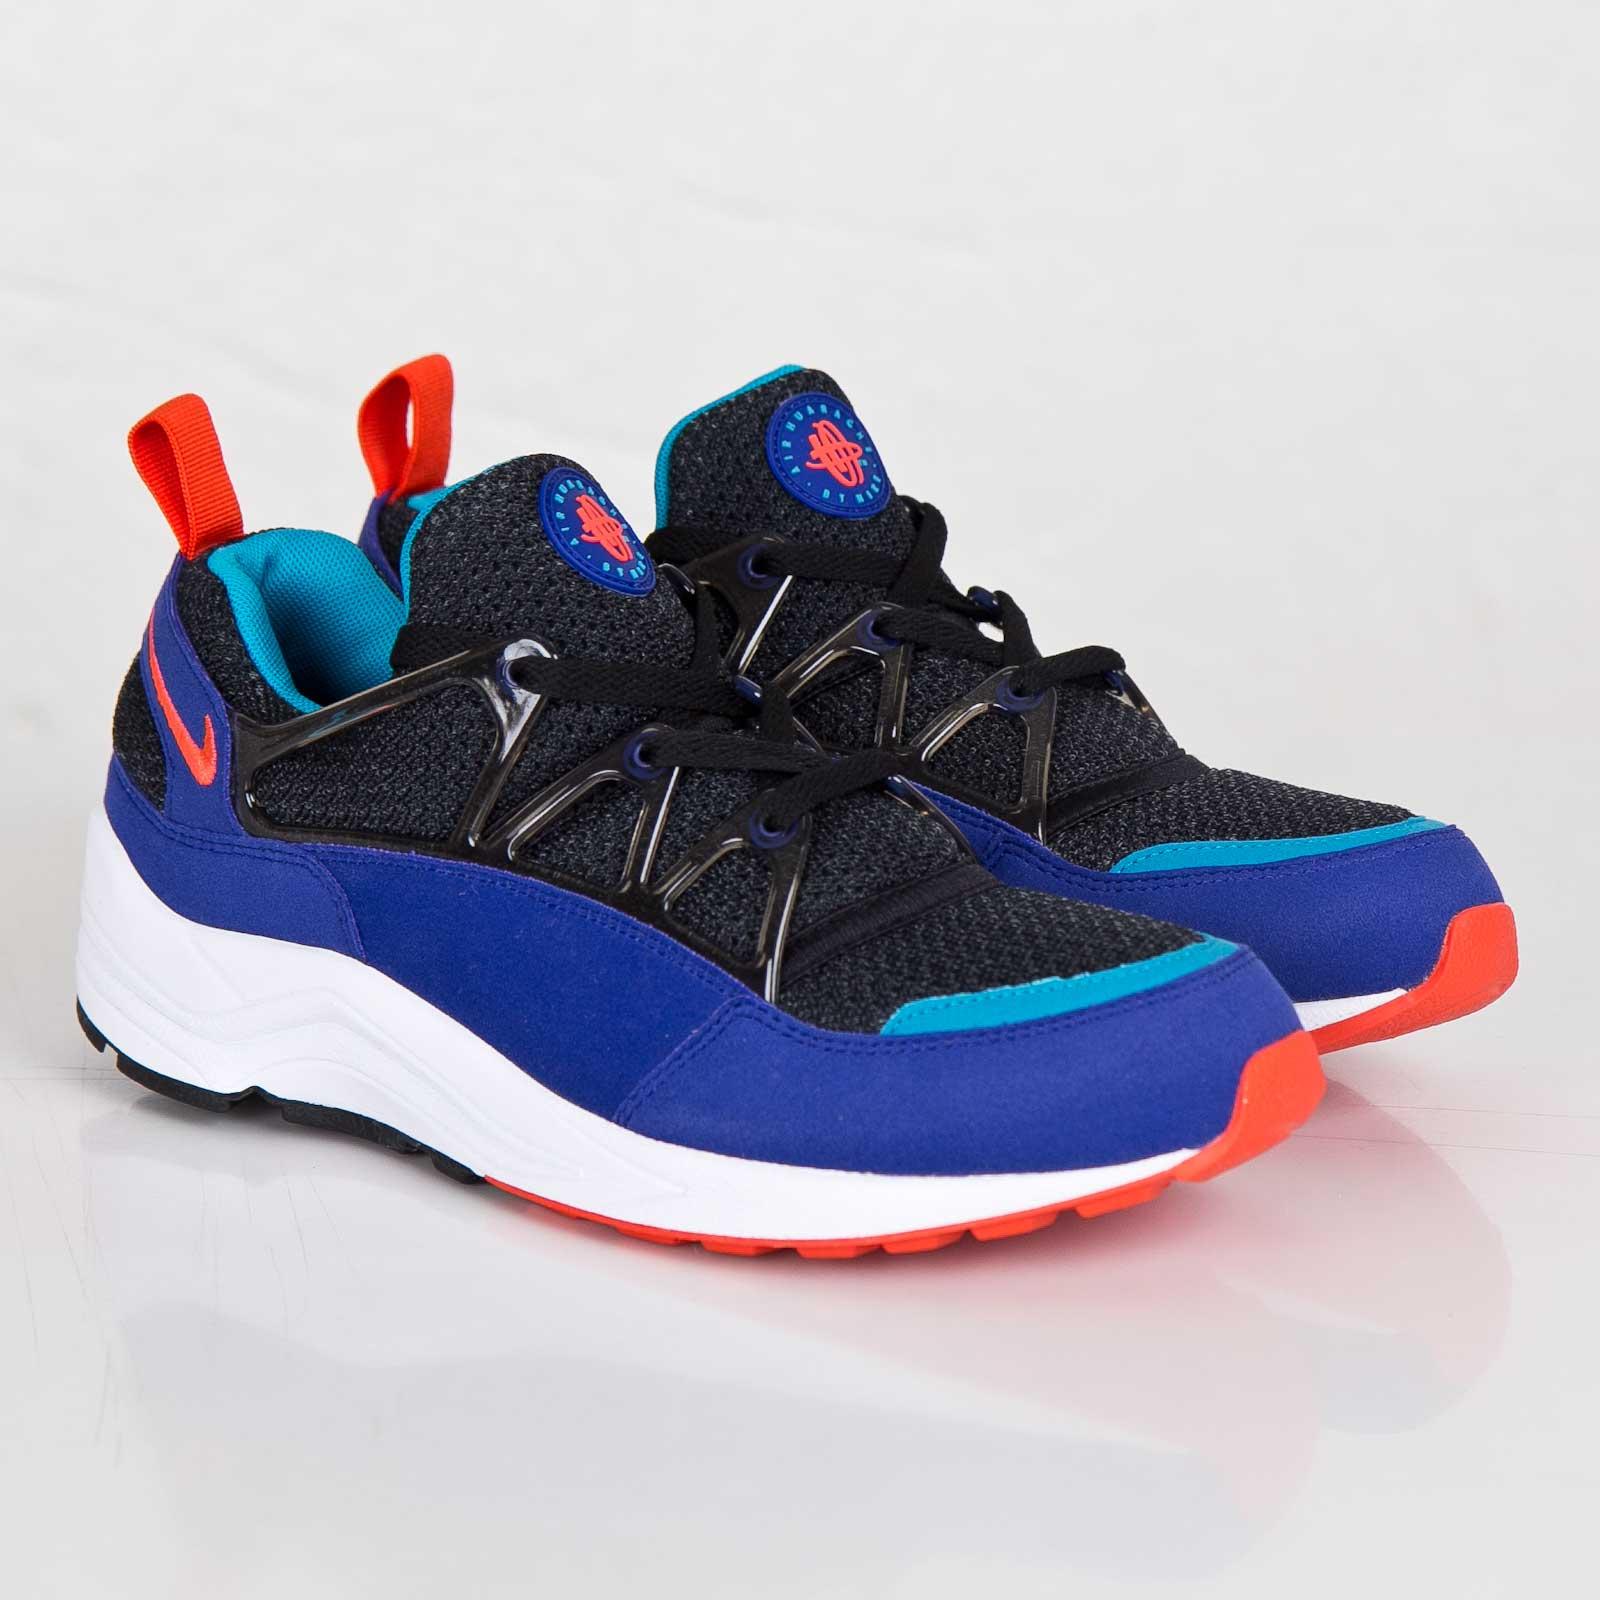 112a371c7587 Nike Air Huarache Light - 306127-480 - Sneakersnstuff